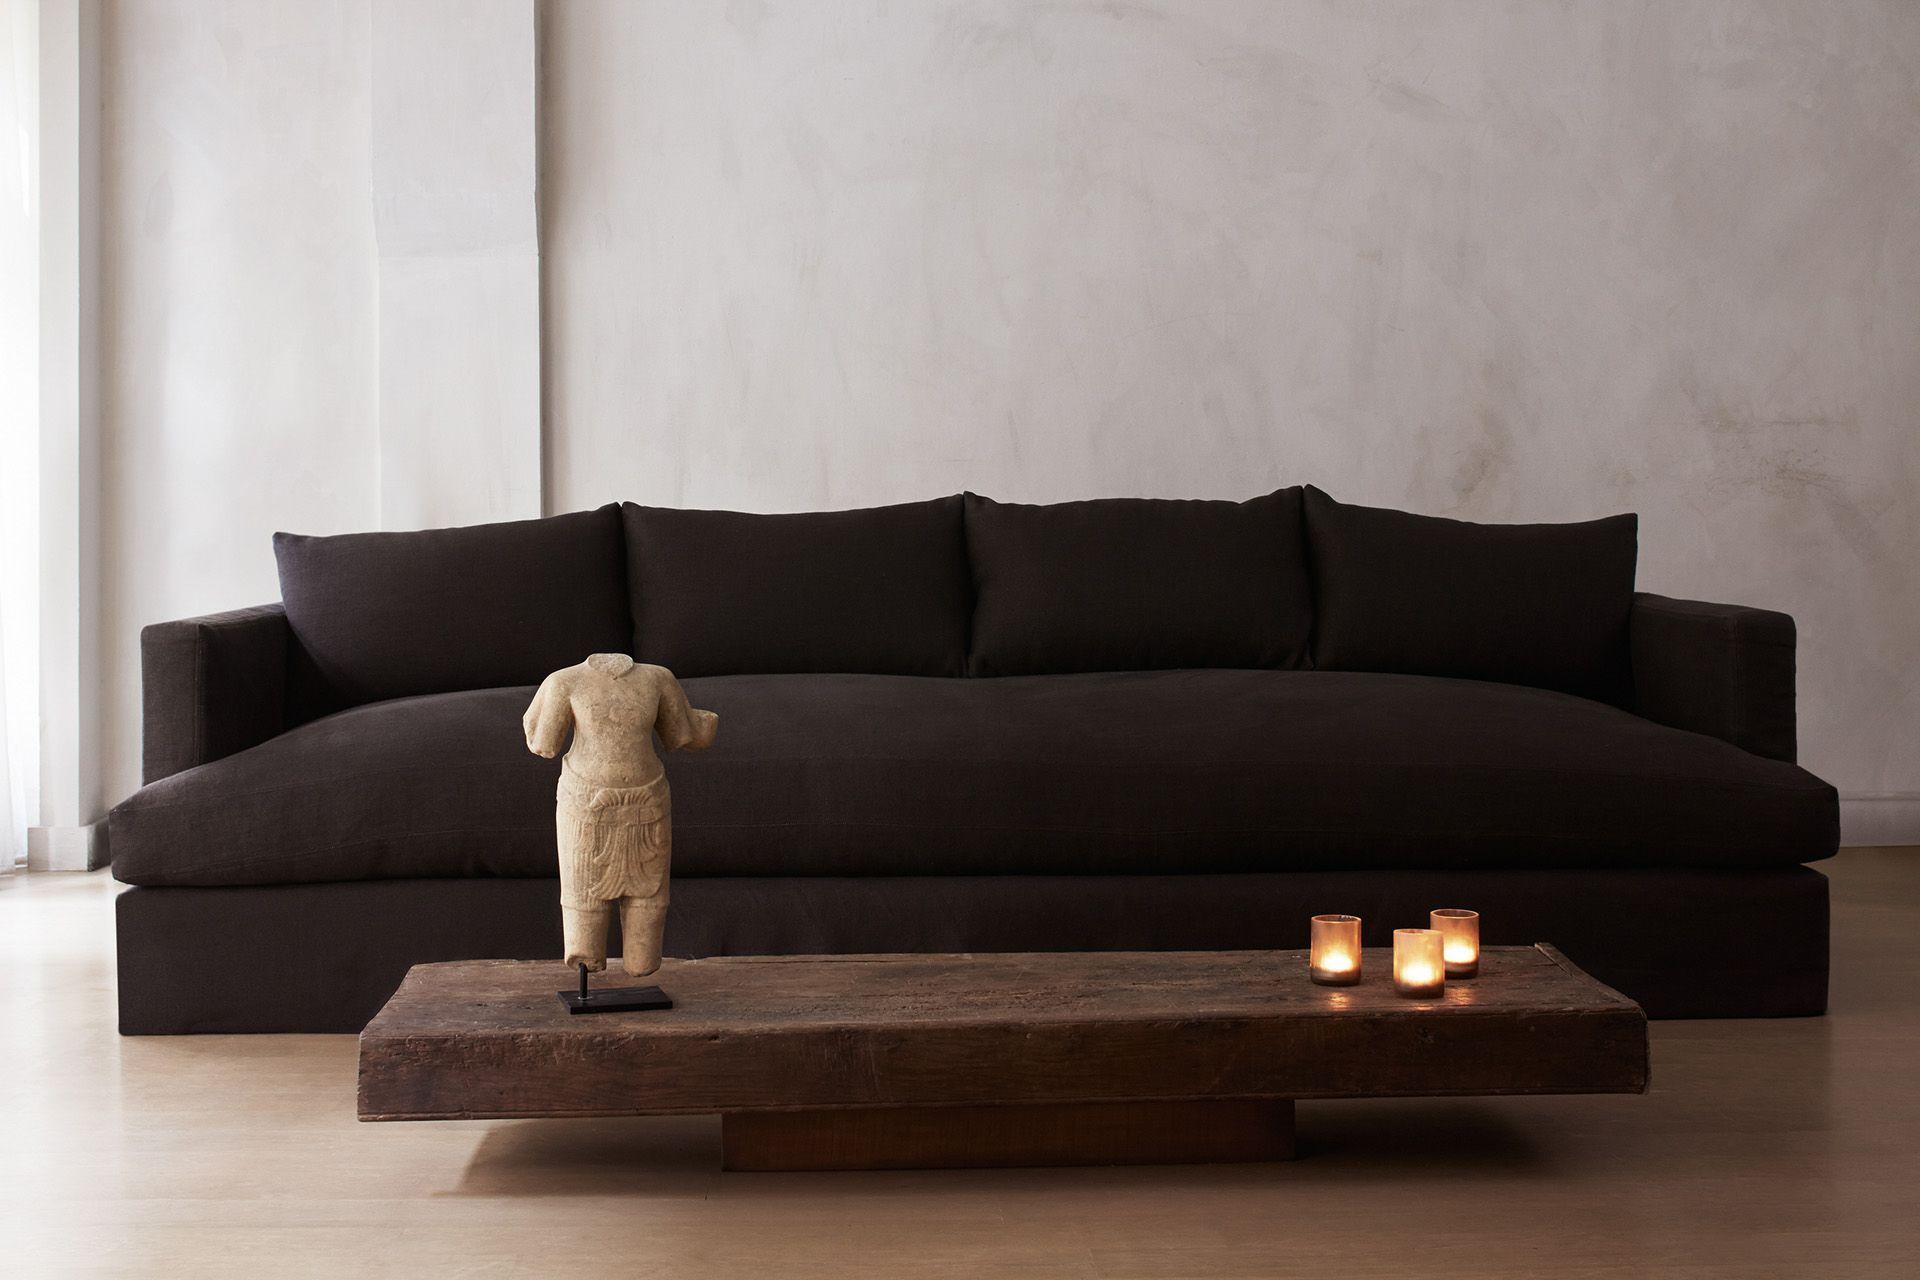 chelsea square sofa horchow search results for loro piana page 2 una malan master deep http dmitriyco com